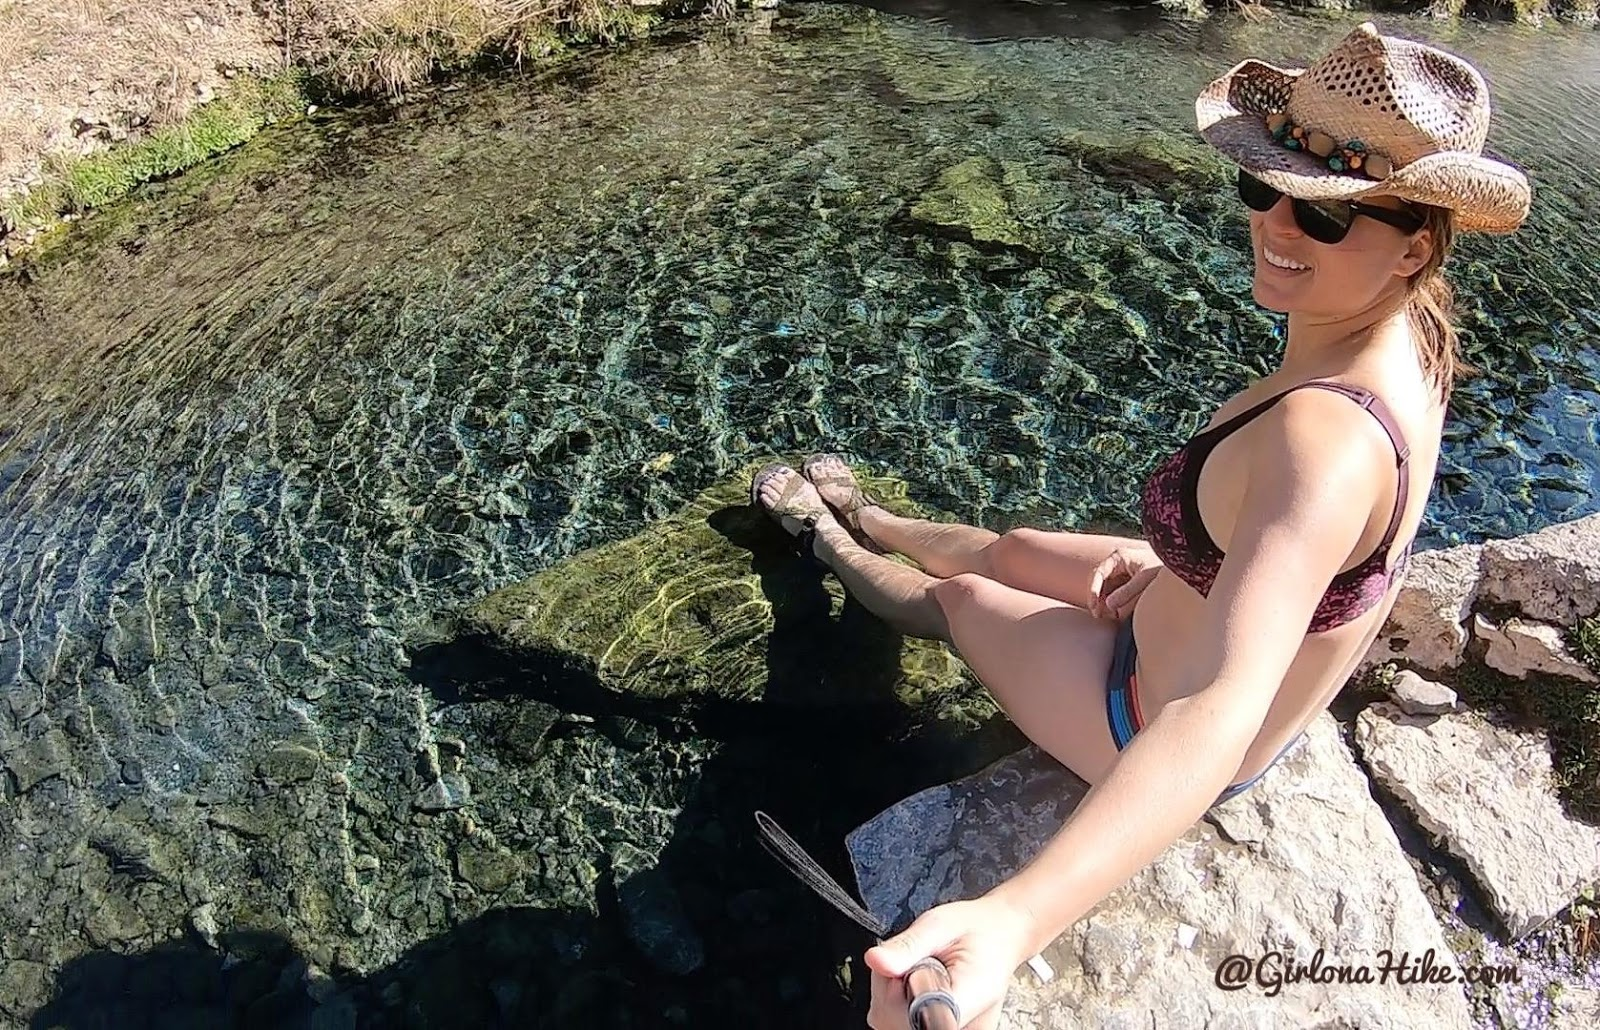 Hiking to 12 Mile (Bishop Creek) Hot Springs